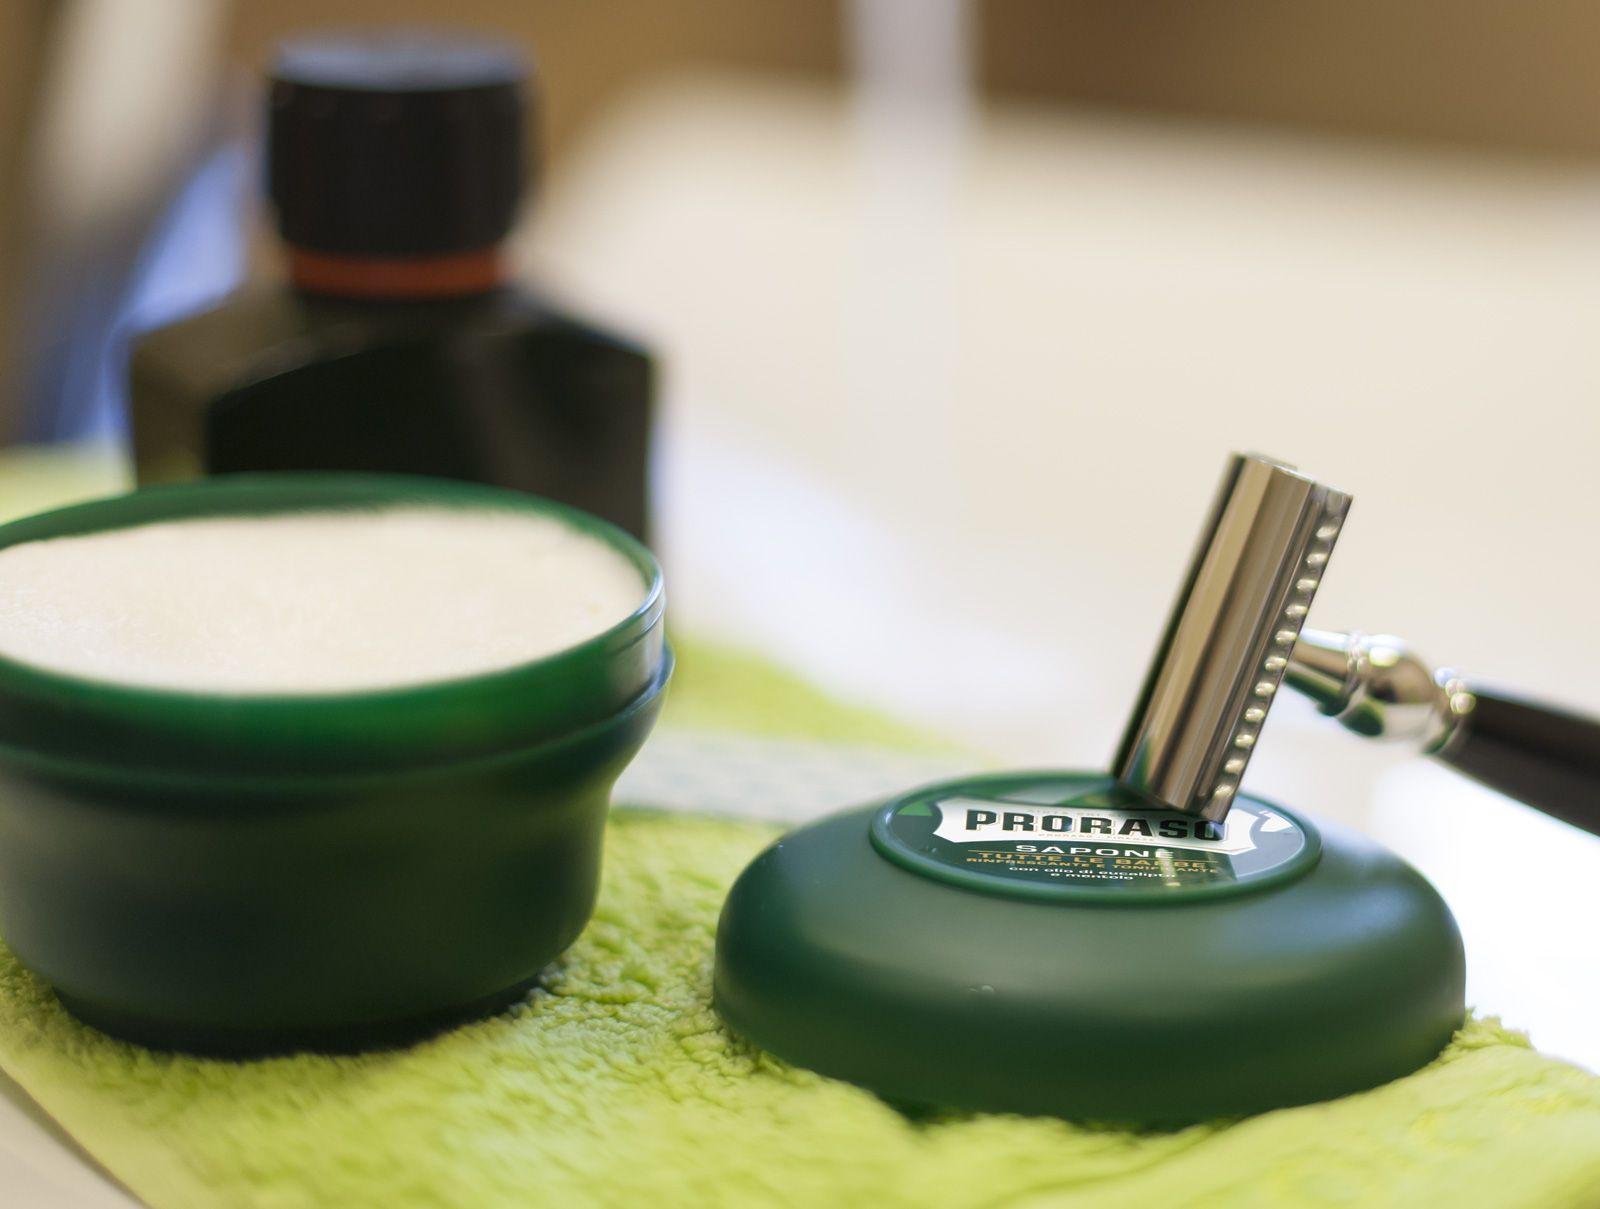 You are currently viewing Proraso Sapone Da Barba Rinfrescante e Tonificante (zielony, verde) – recenzja mydła do golenia